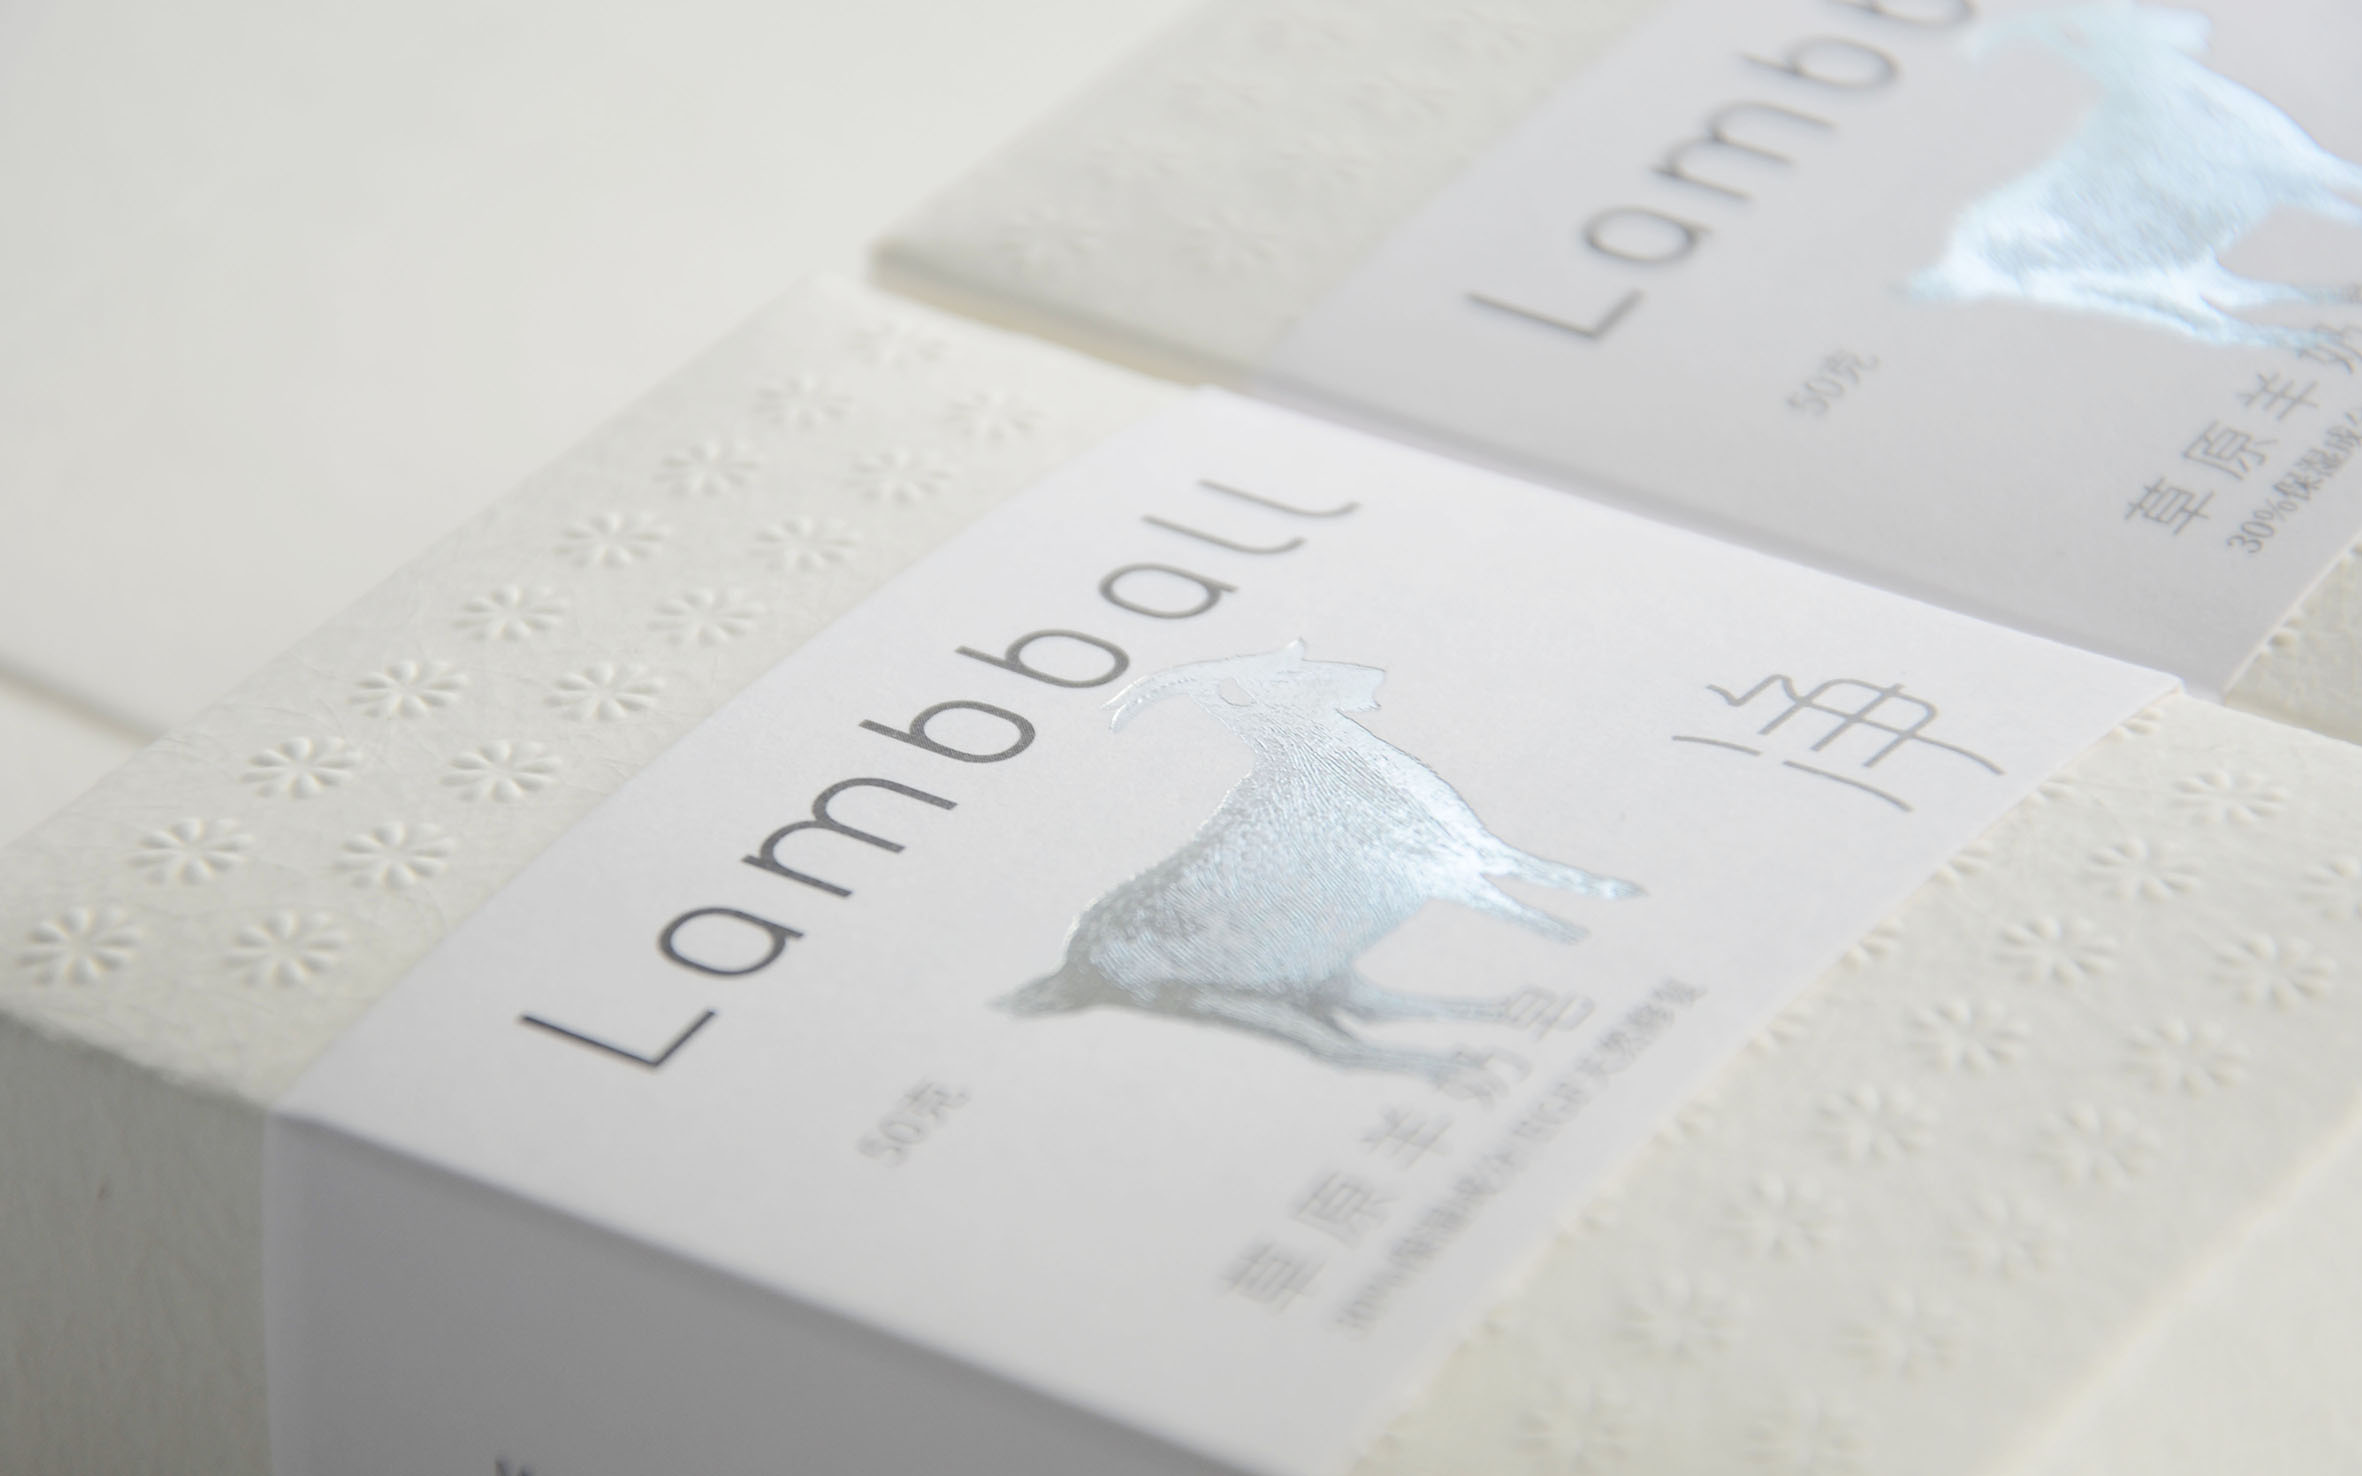 lambball羊奶皂包装设计 第6张 lambball羊奶皂包装设计 蒙古设计